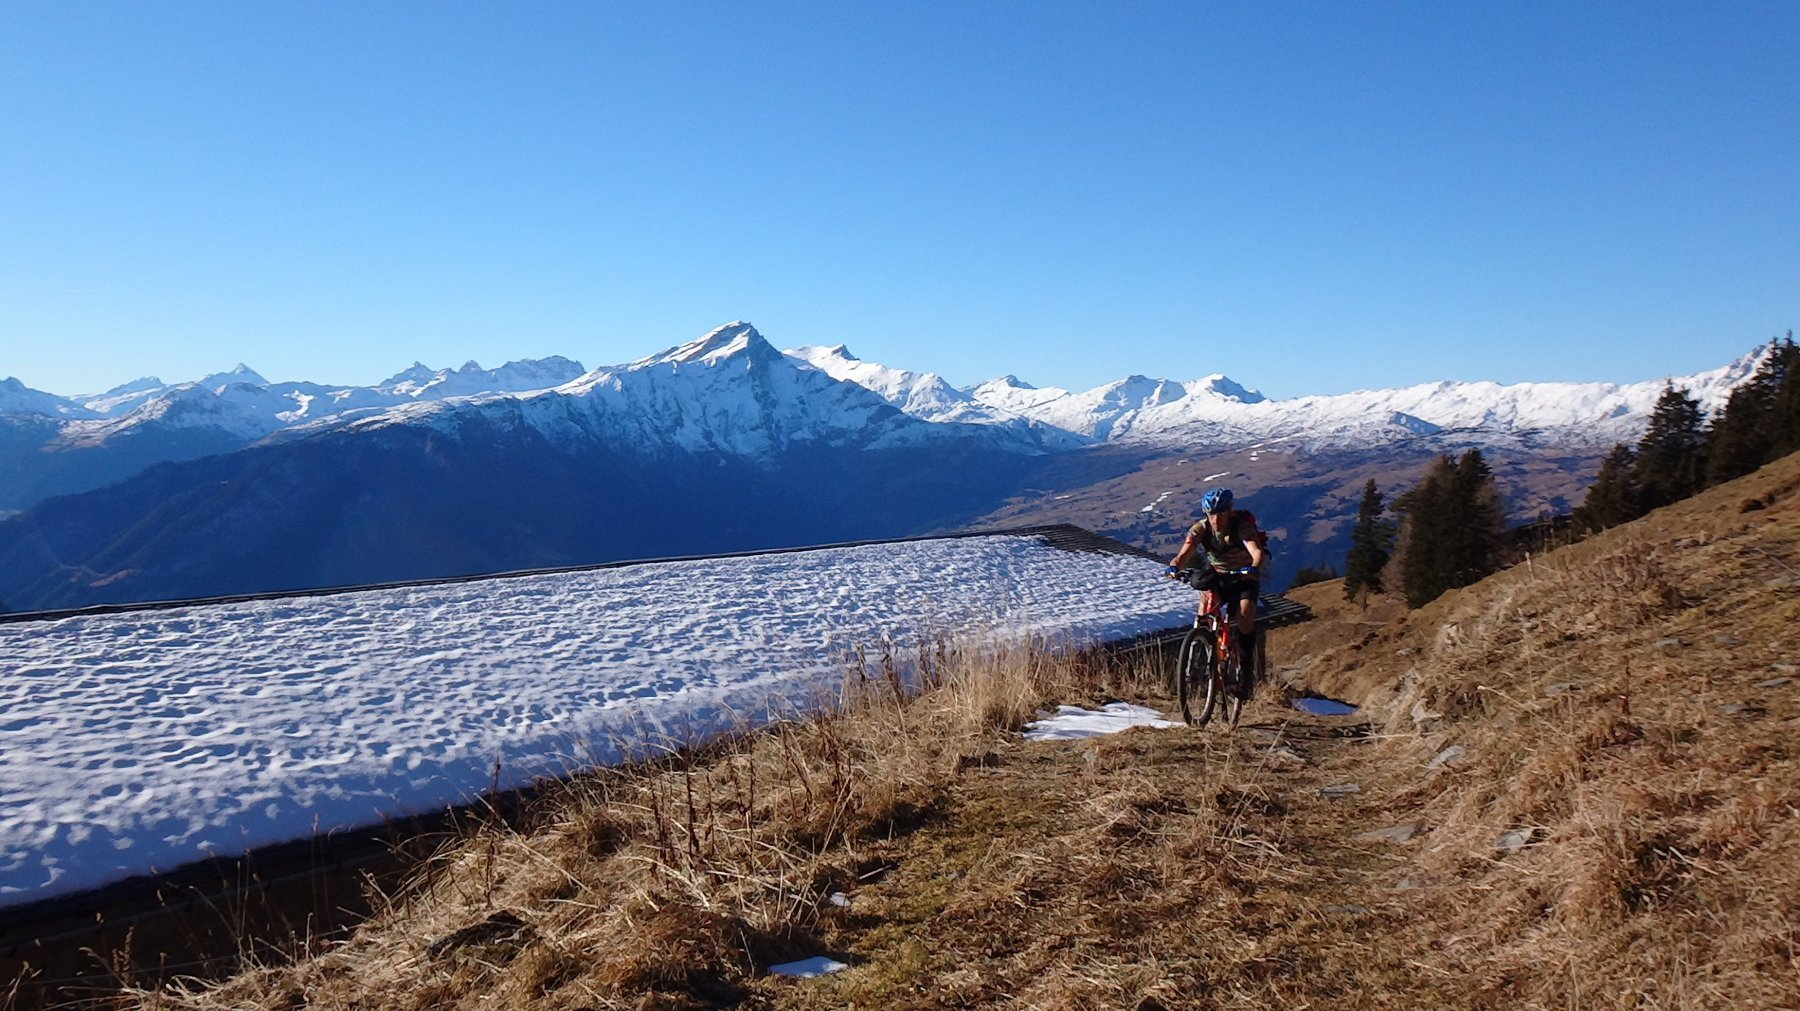 Alp Danis e Piz Beverin l'unica neve è sul tetto